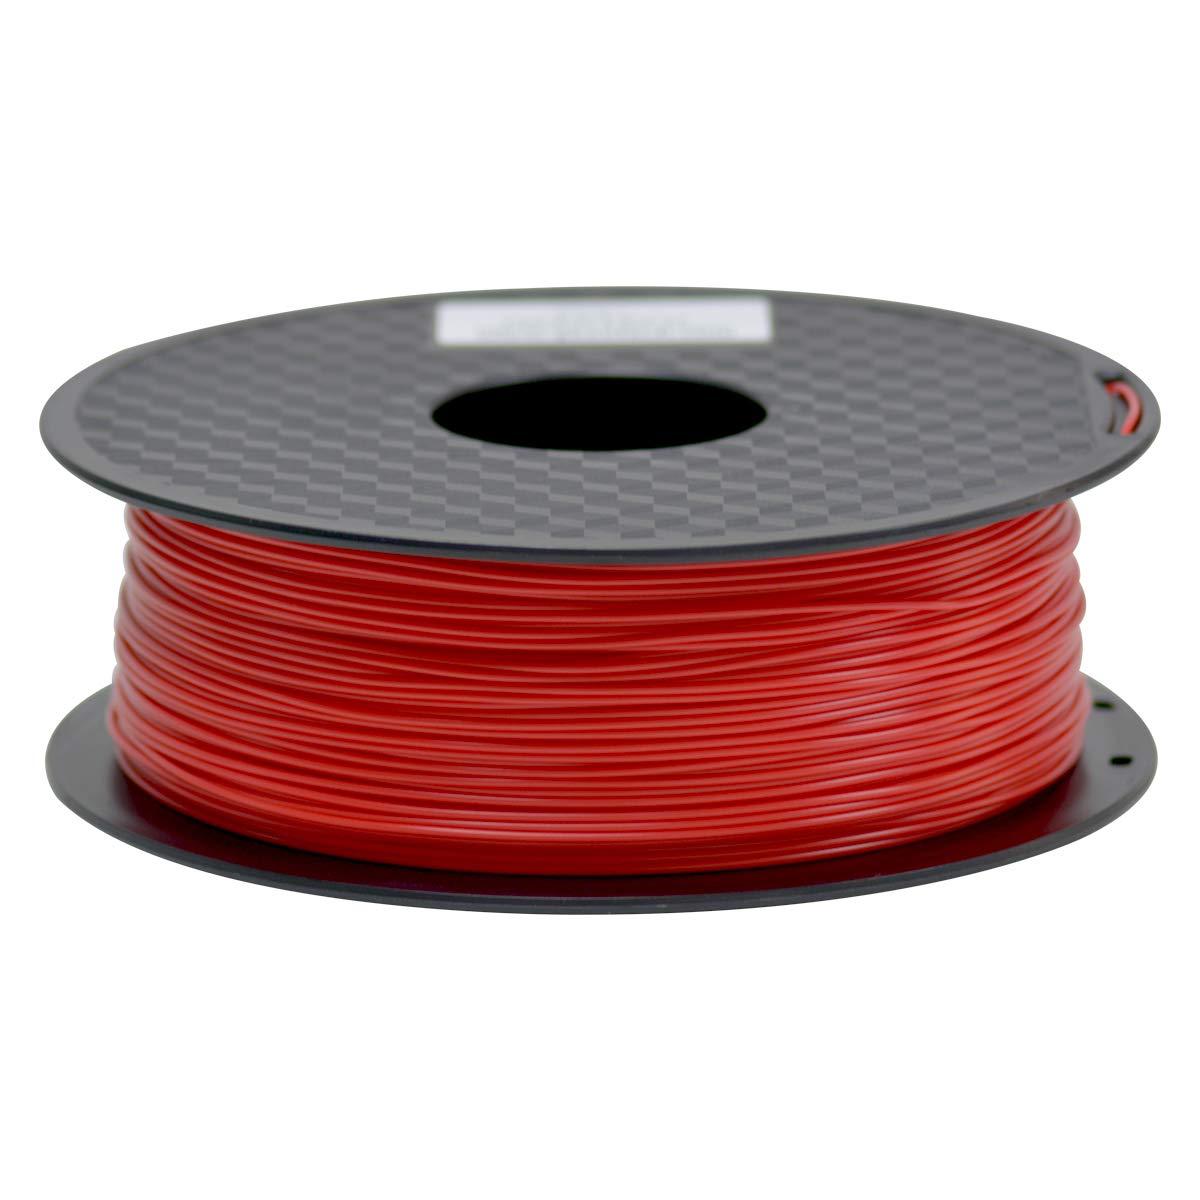 GEEETECH Filament PLA 1.75mm Schwarz 3D Drucker PLA Filament 1kg Spool